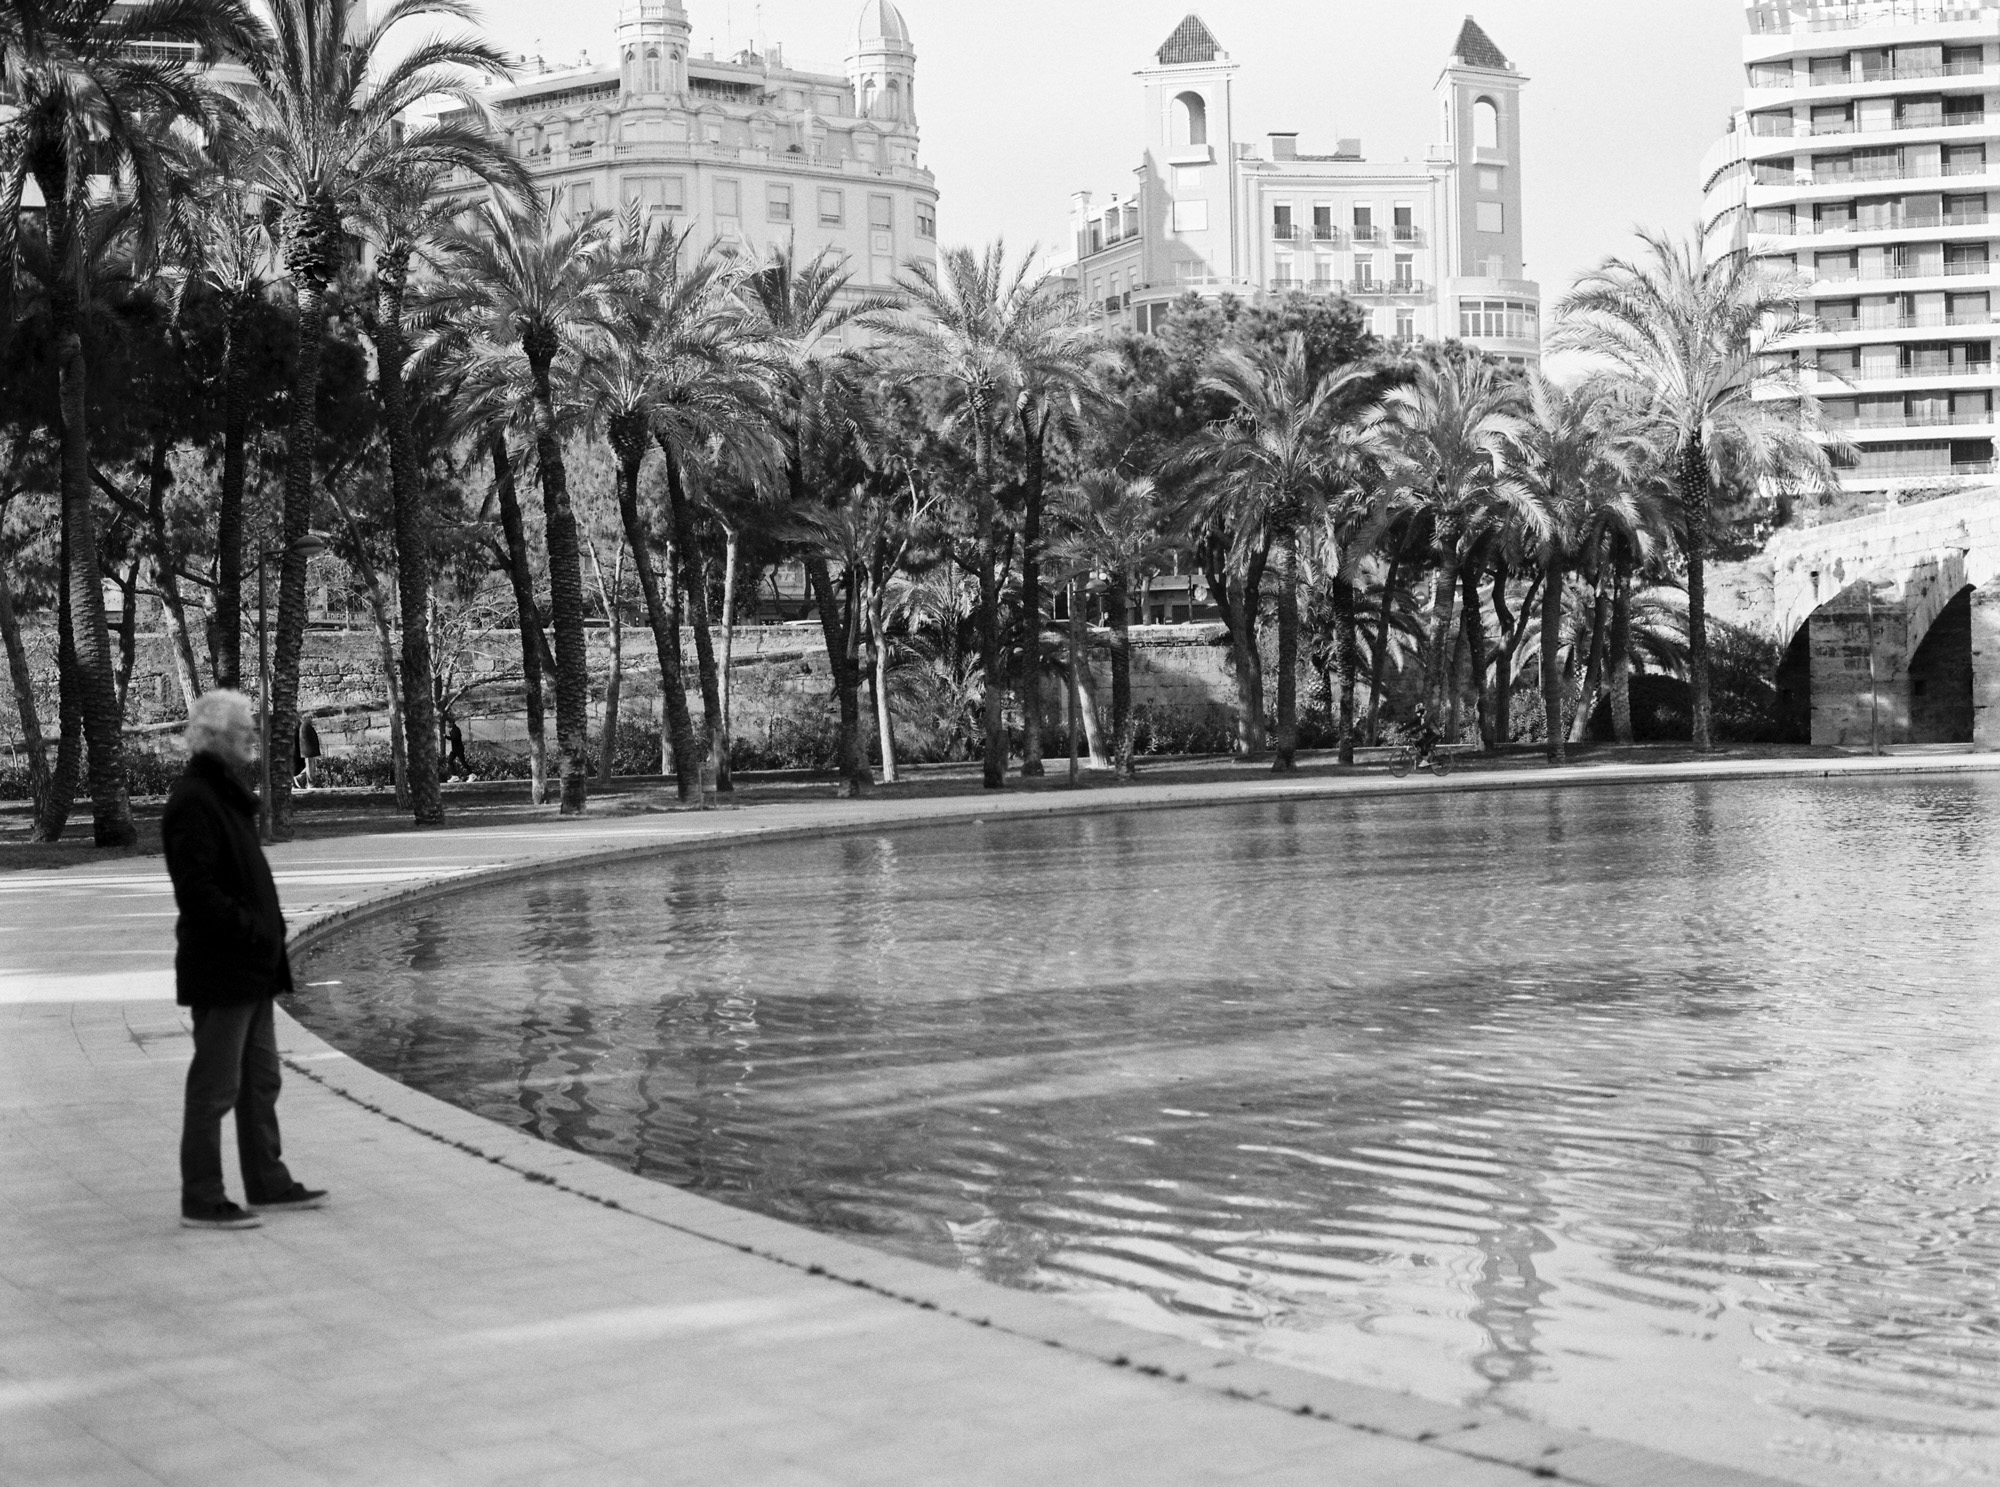 PimVan_Valencia-14.jpg